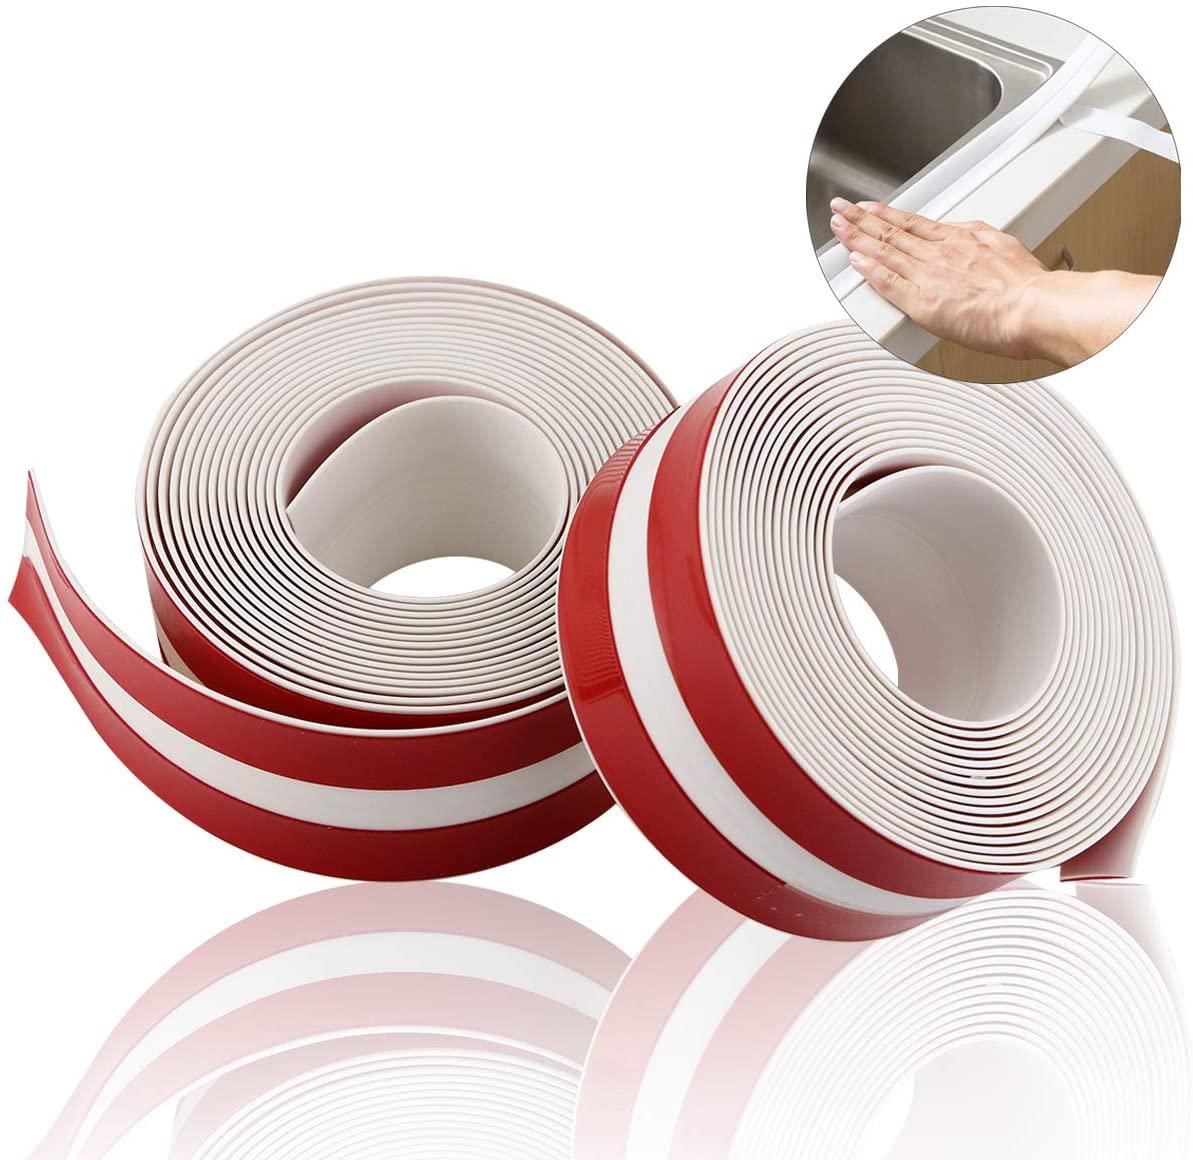 Twdrer 2 Rolls PE Caulk Strip Self-Adhesive Waterproof Sealing Strip Tape Decorative Sealant Trim,Bathroom Shower Toilet Kitchen Floor Wall Edge Protector,White, 126